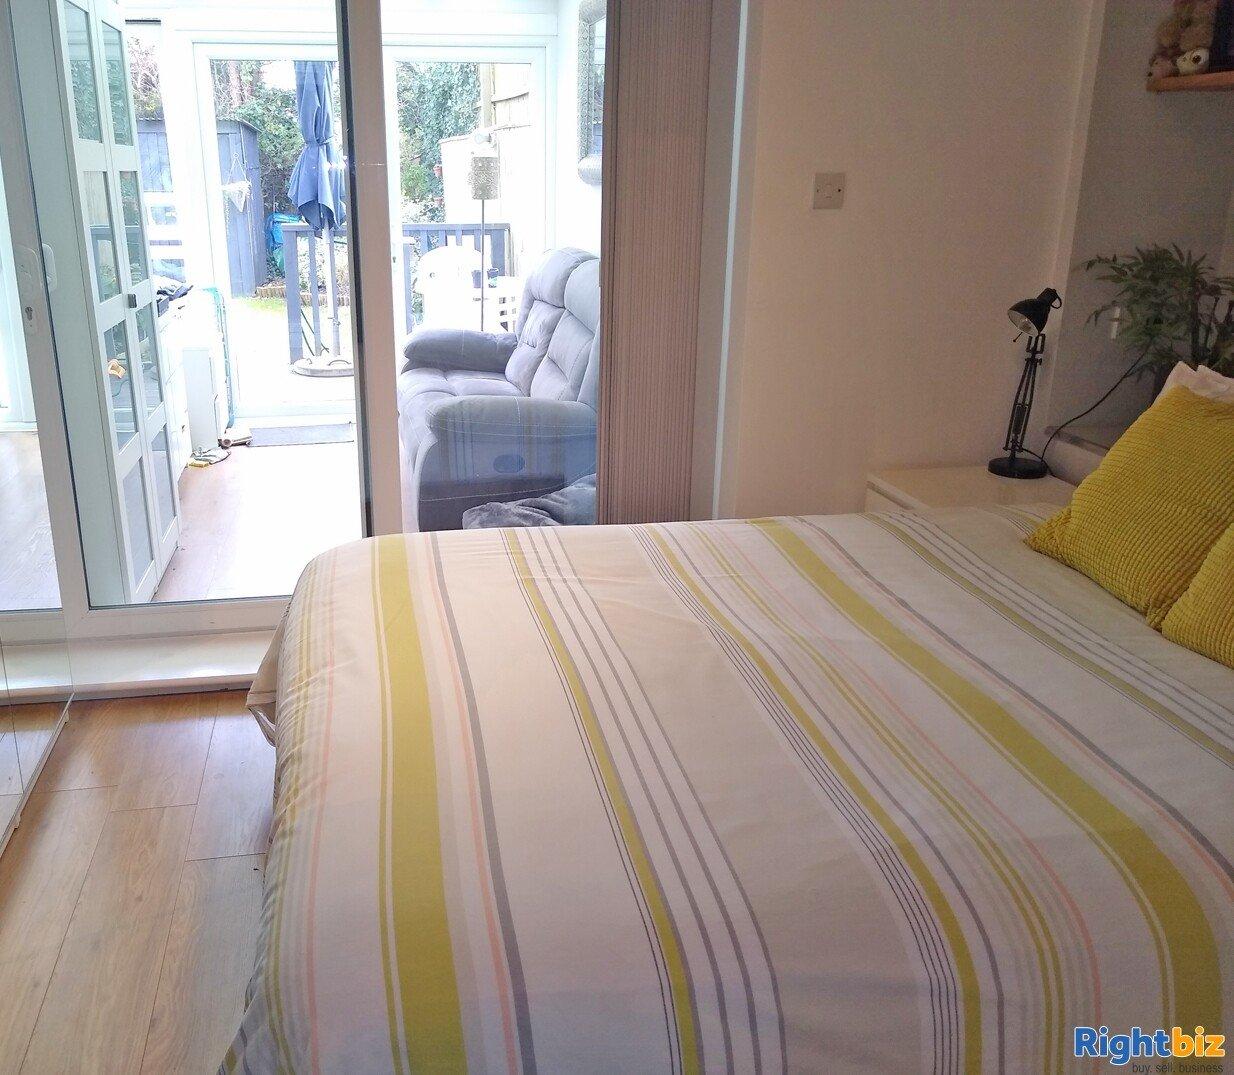 High Quality Home & Income B&B - Lymington - Image 9